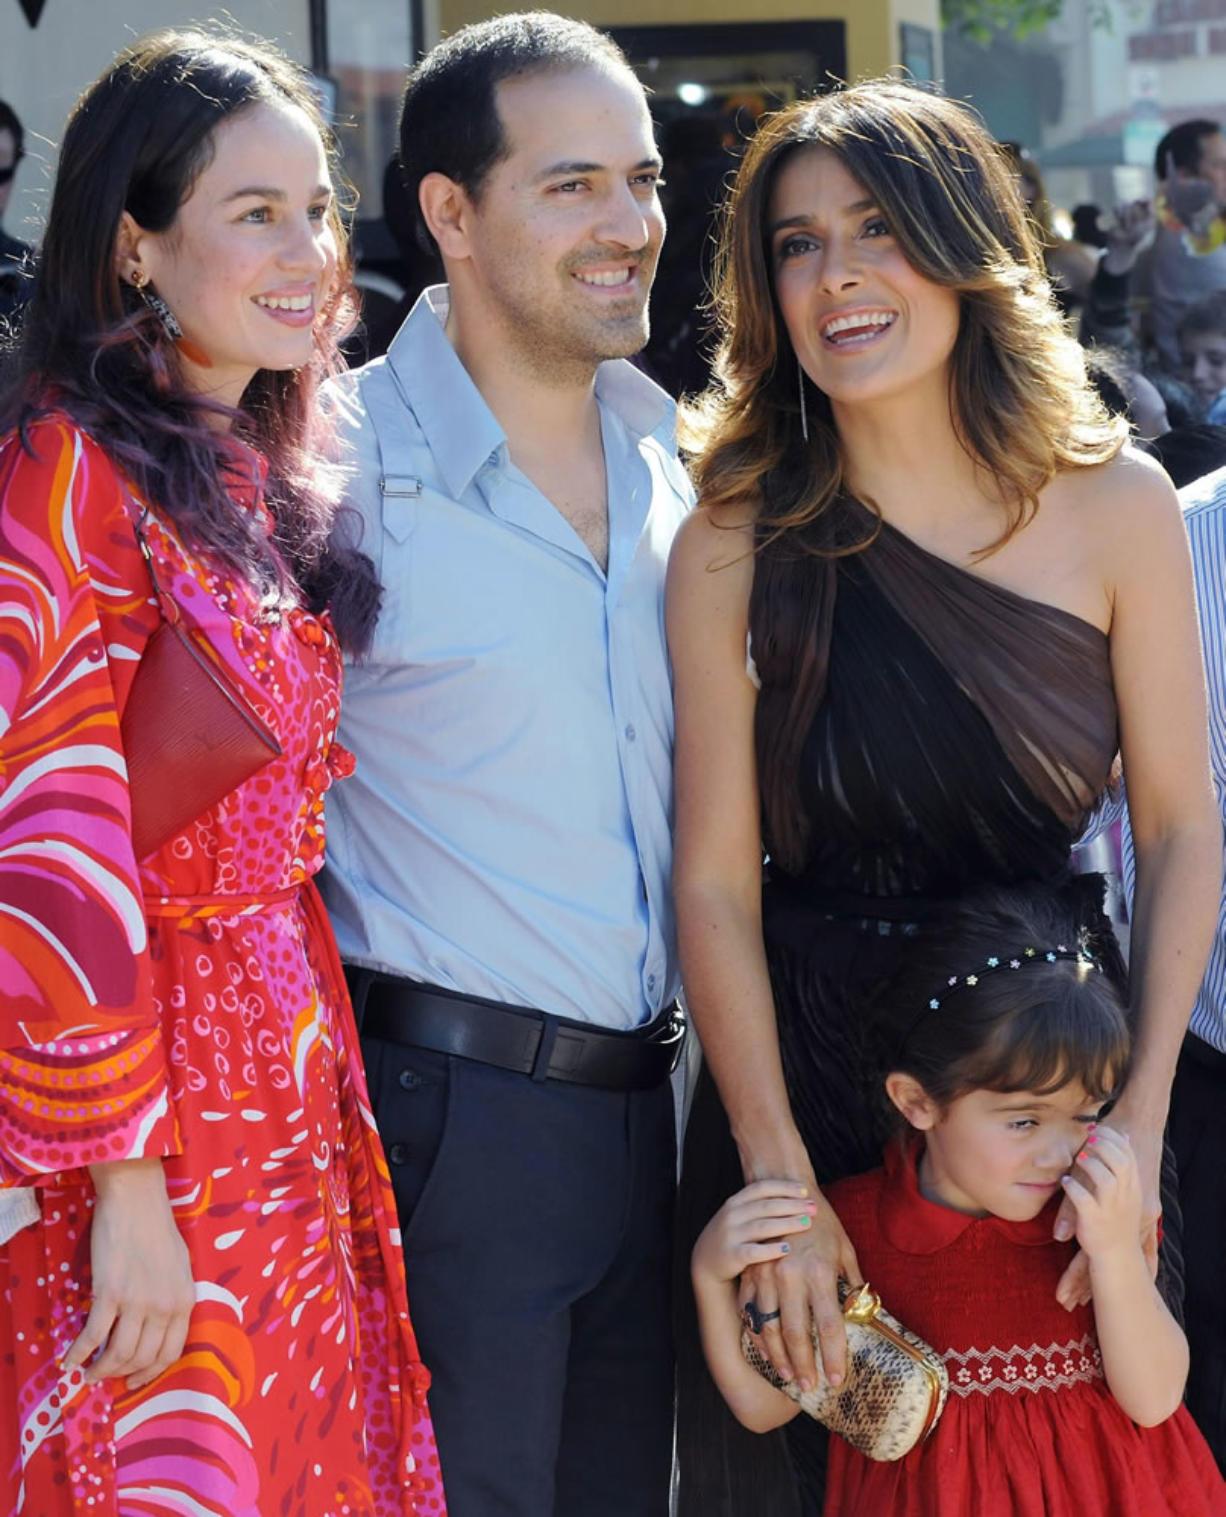 Crash hurts Salma Hayek's brother, kills passenger